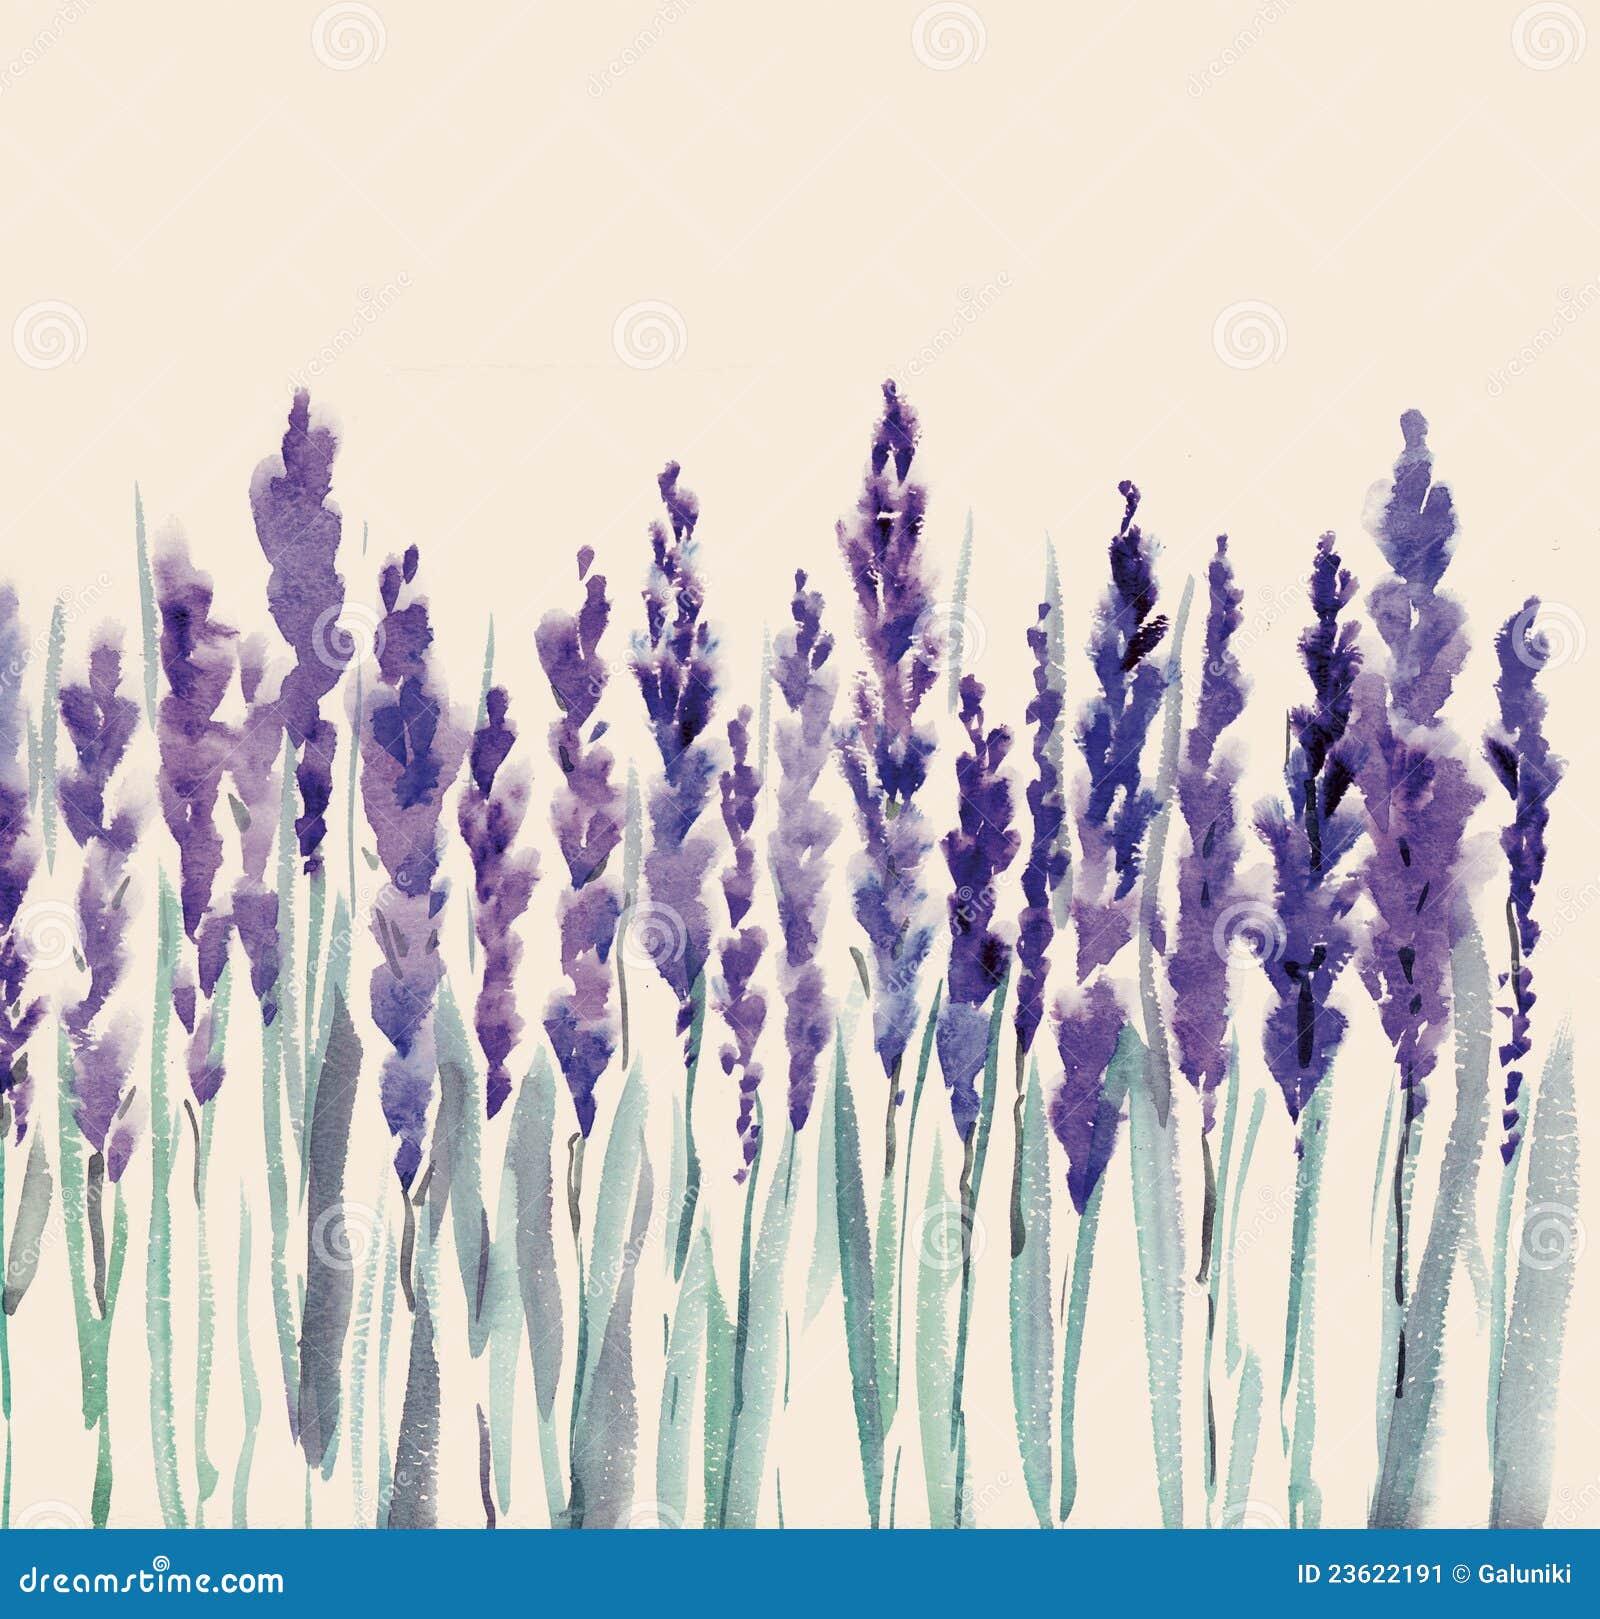 Lavender Flowers Stock Image - Image: 23622191